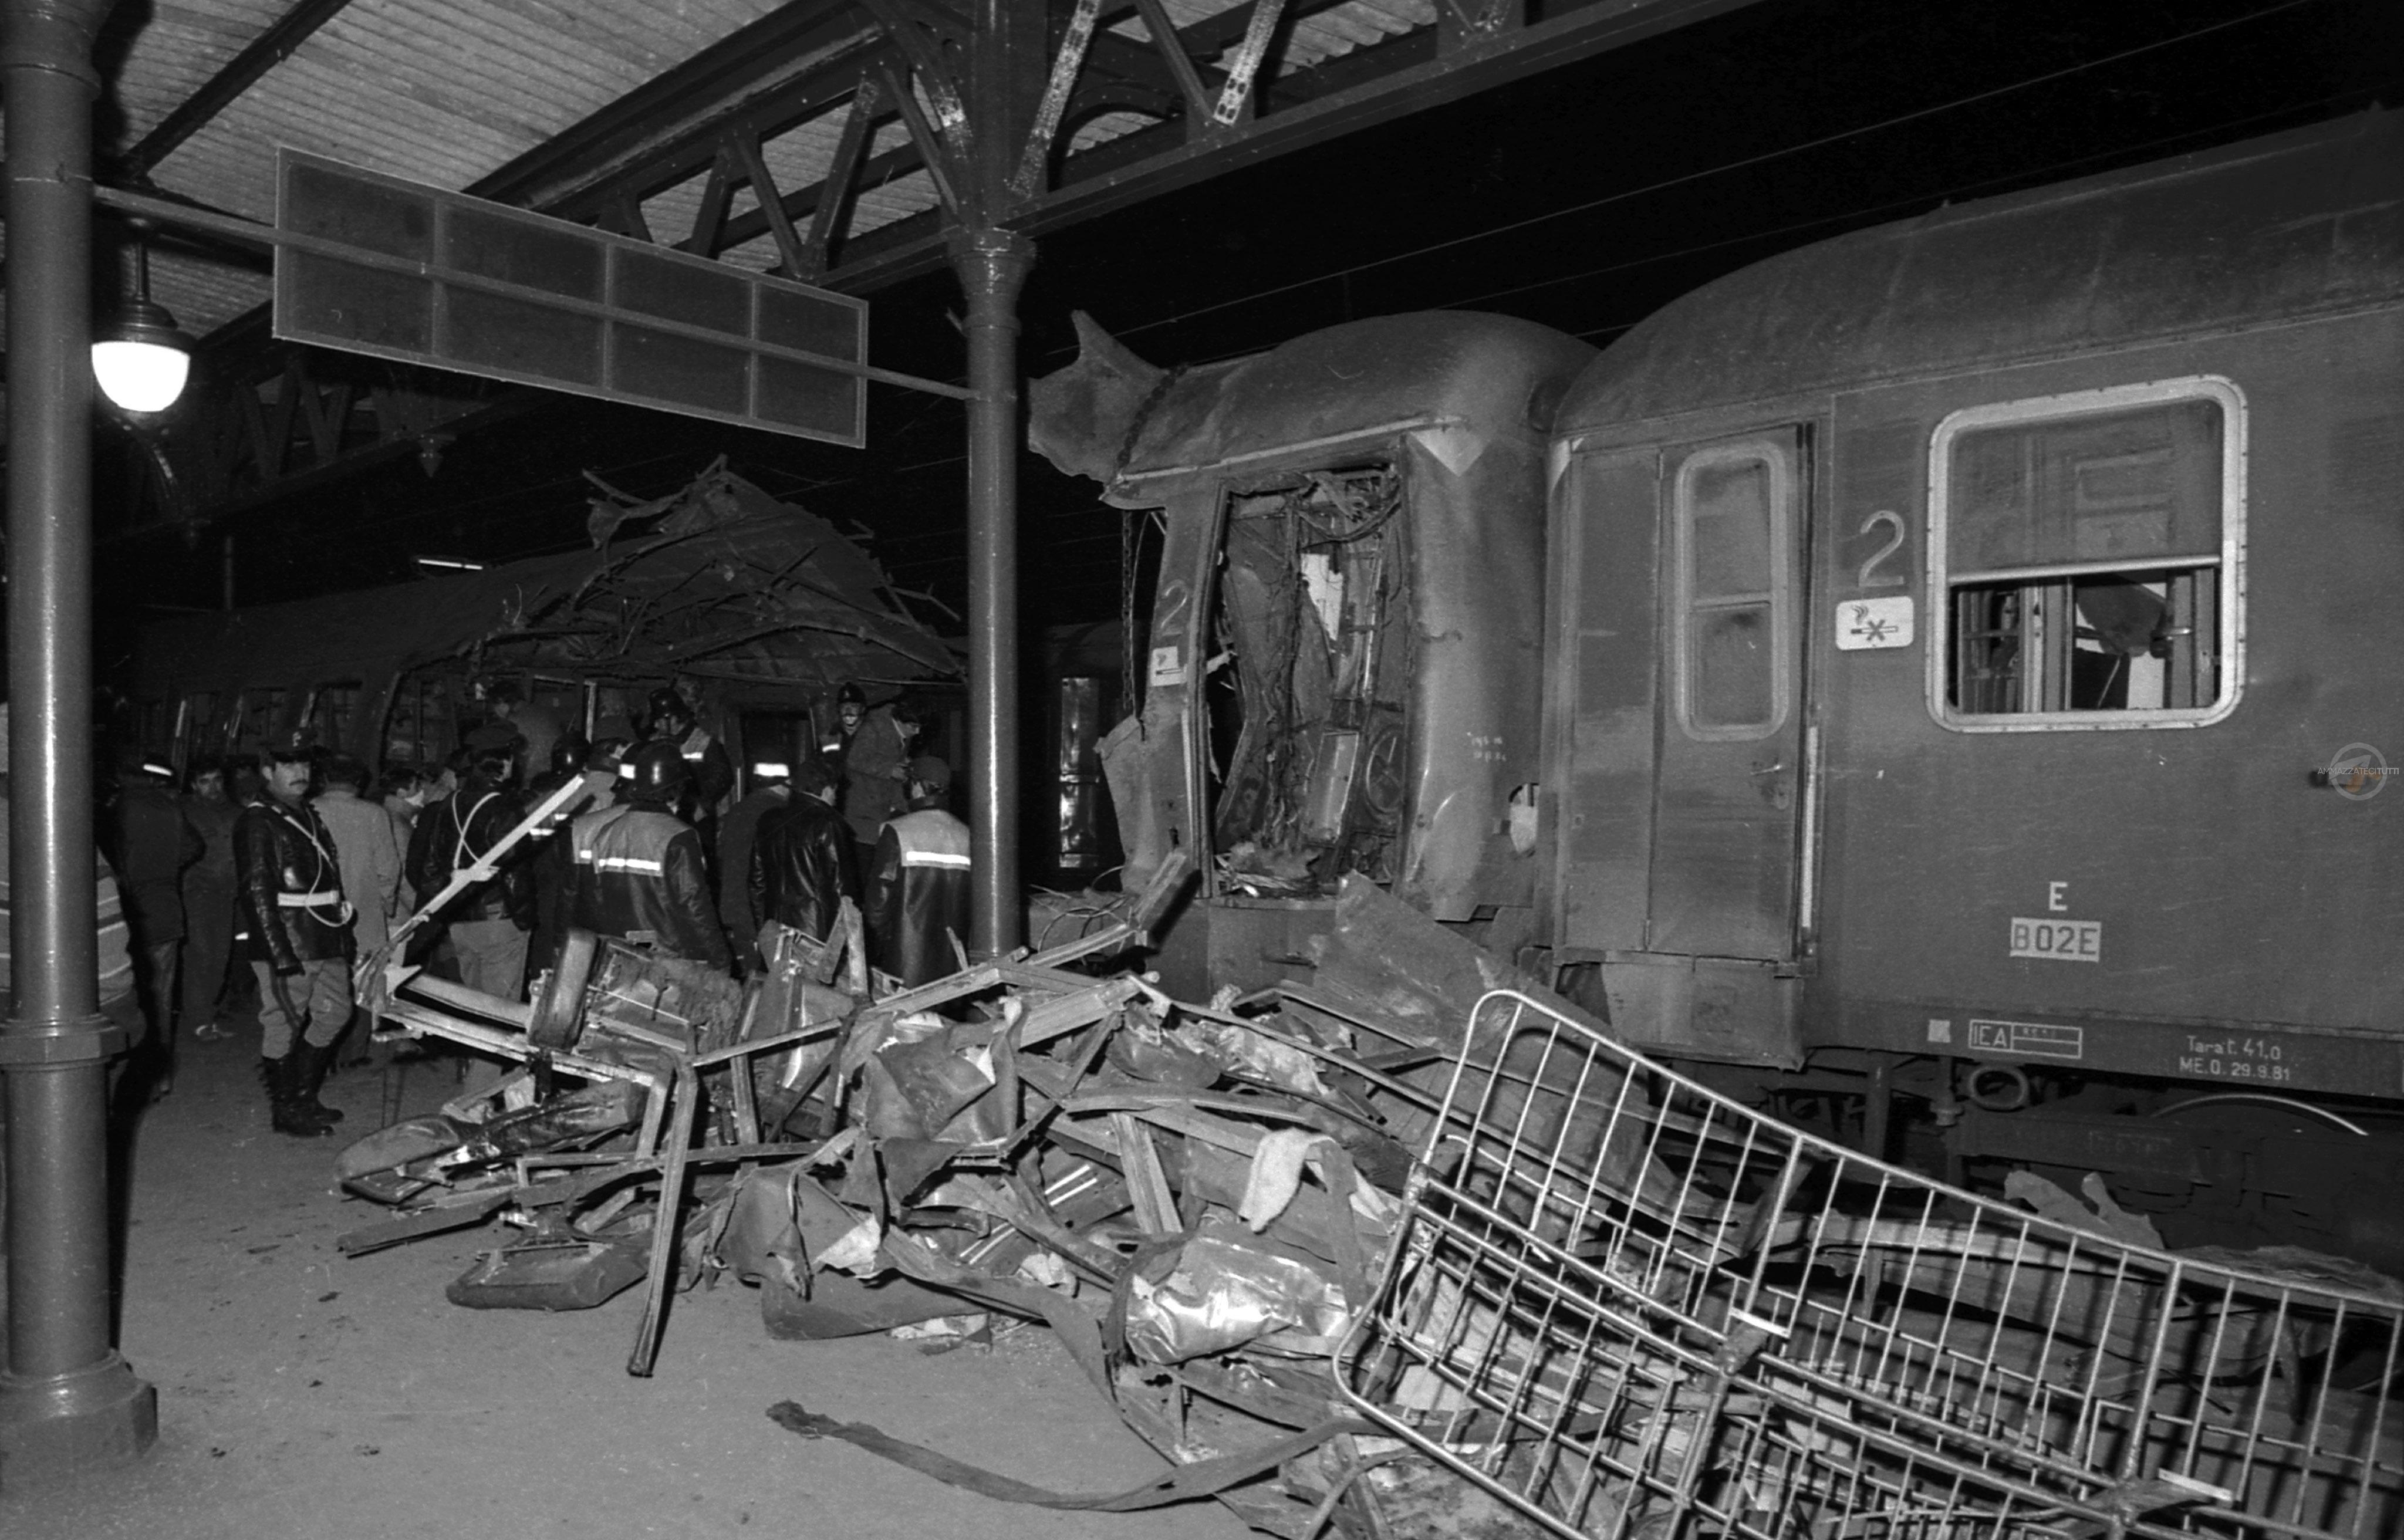 La strage del treno Rapido 904